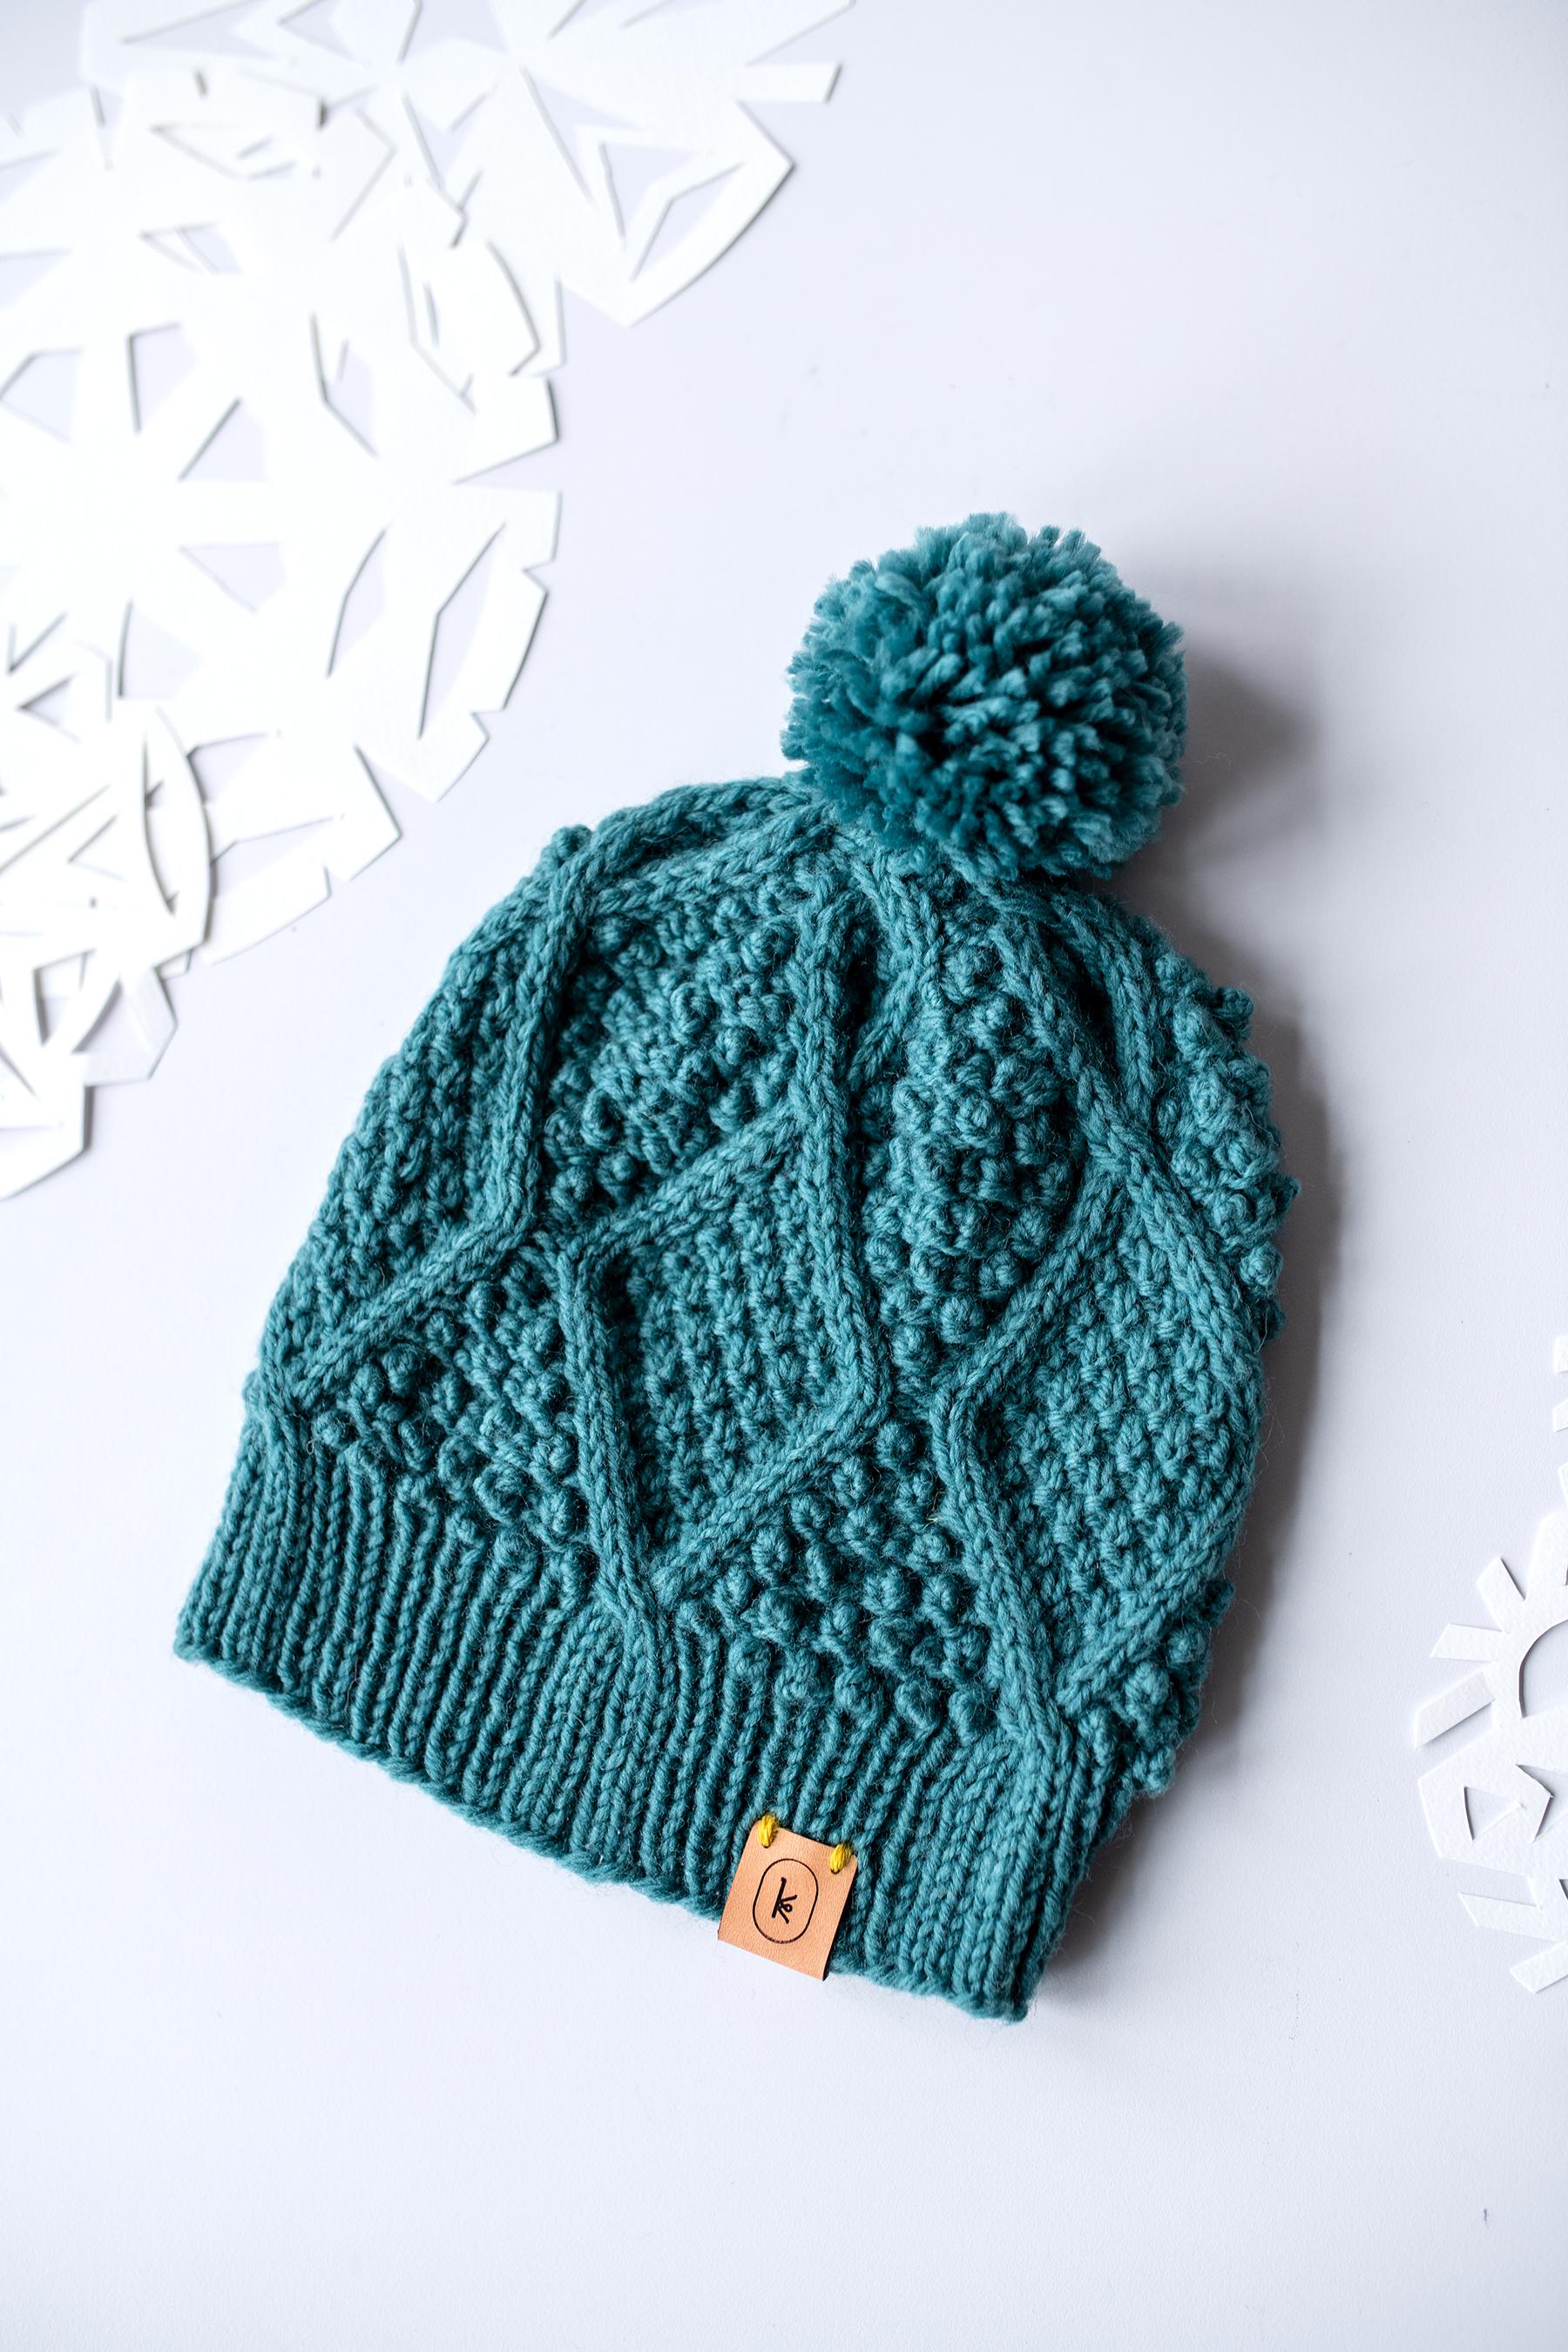 January Hat by Courtney Kelley. Image © Linette Kielinski.